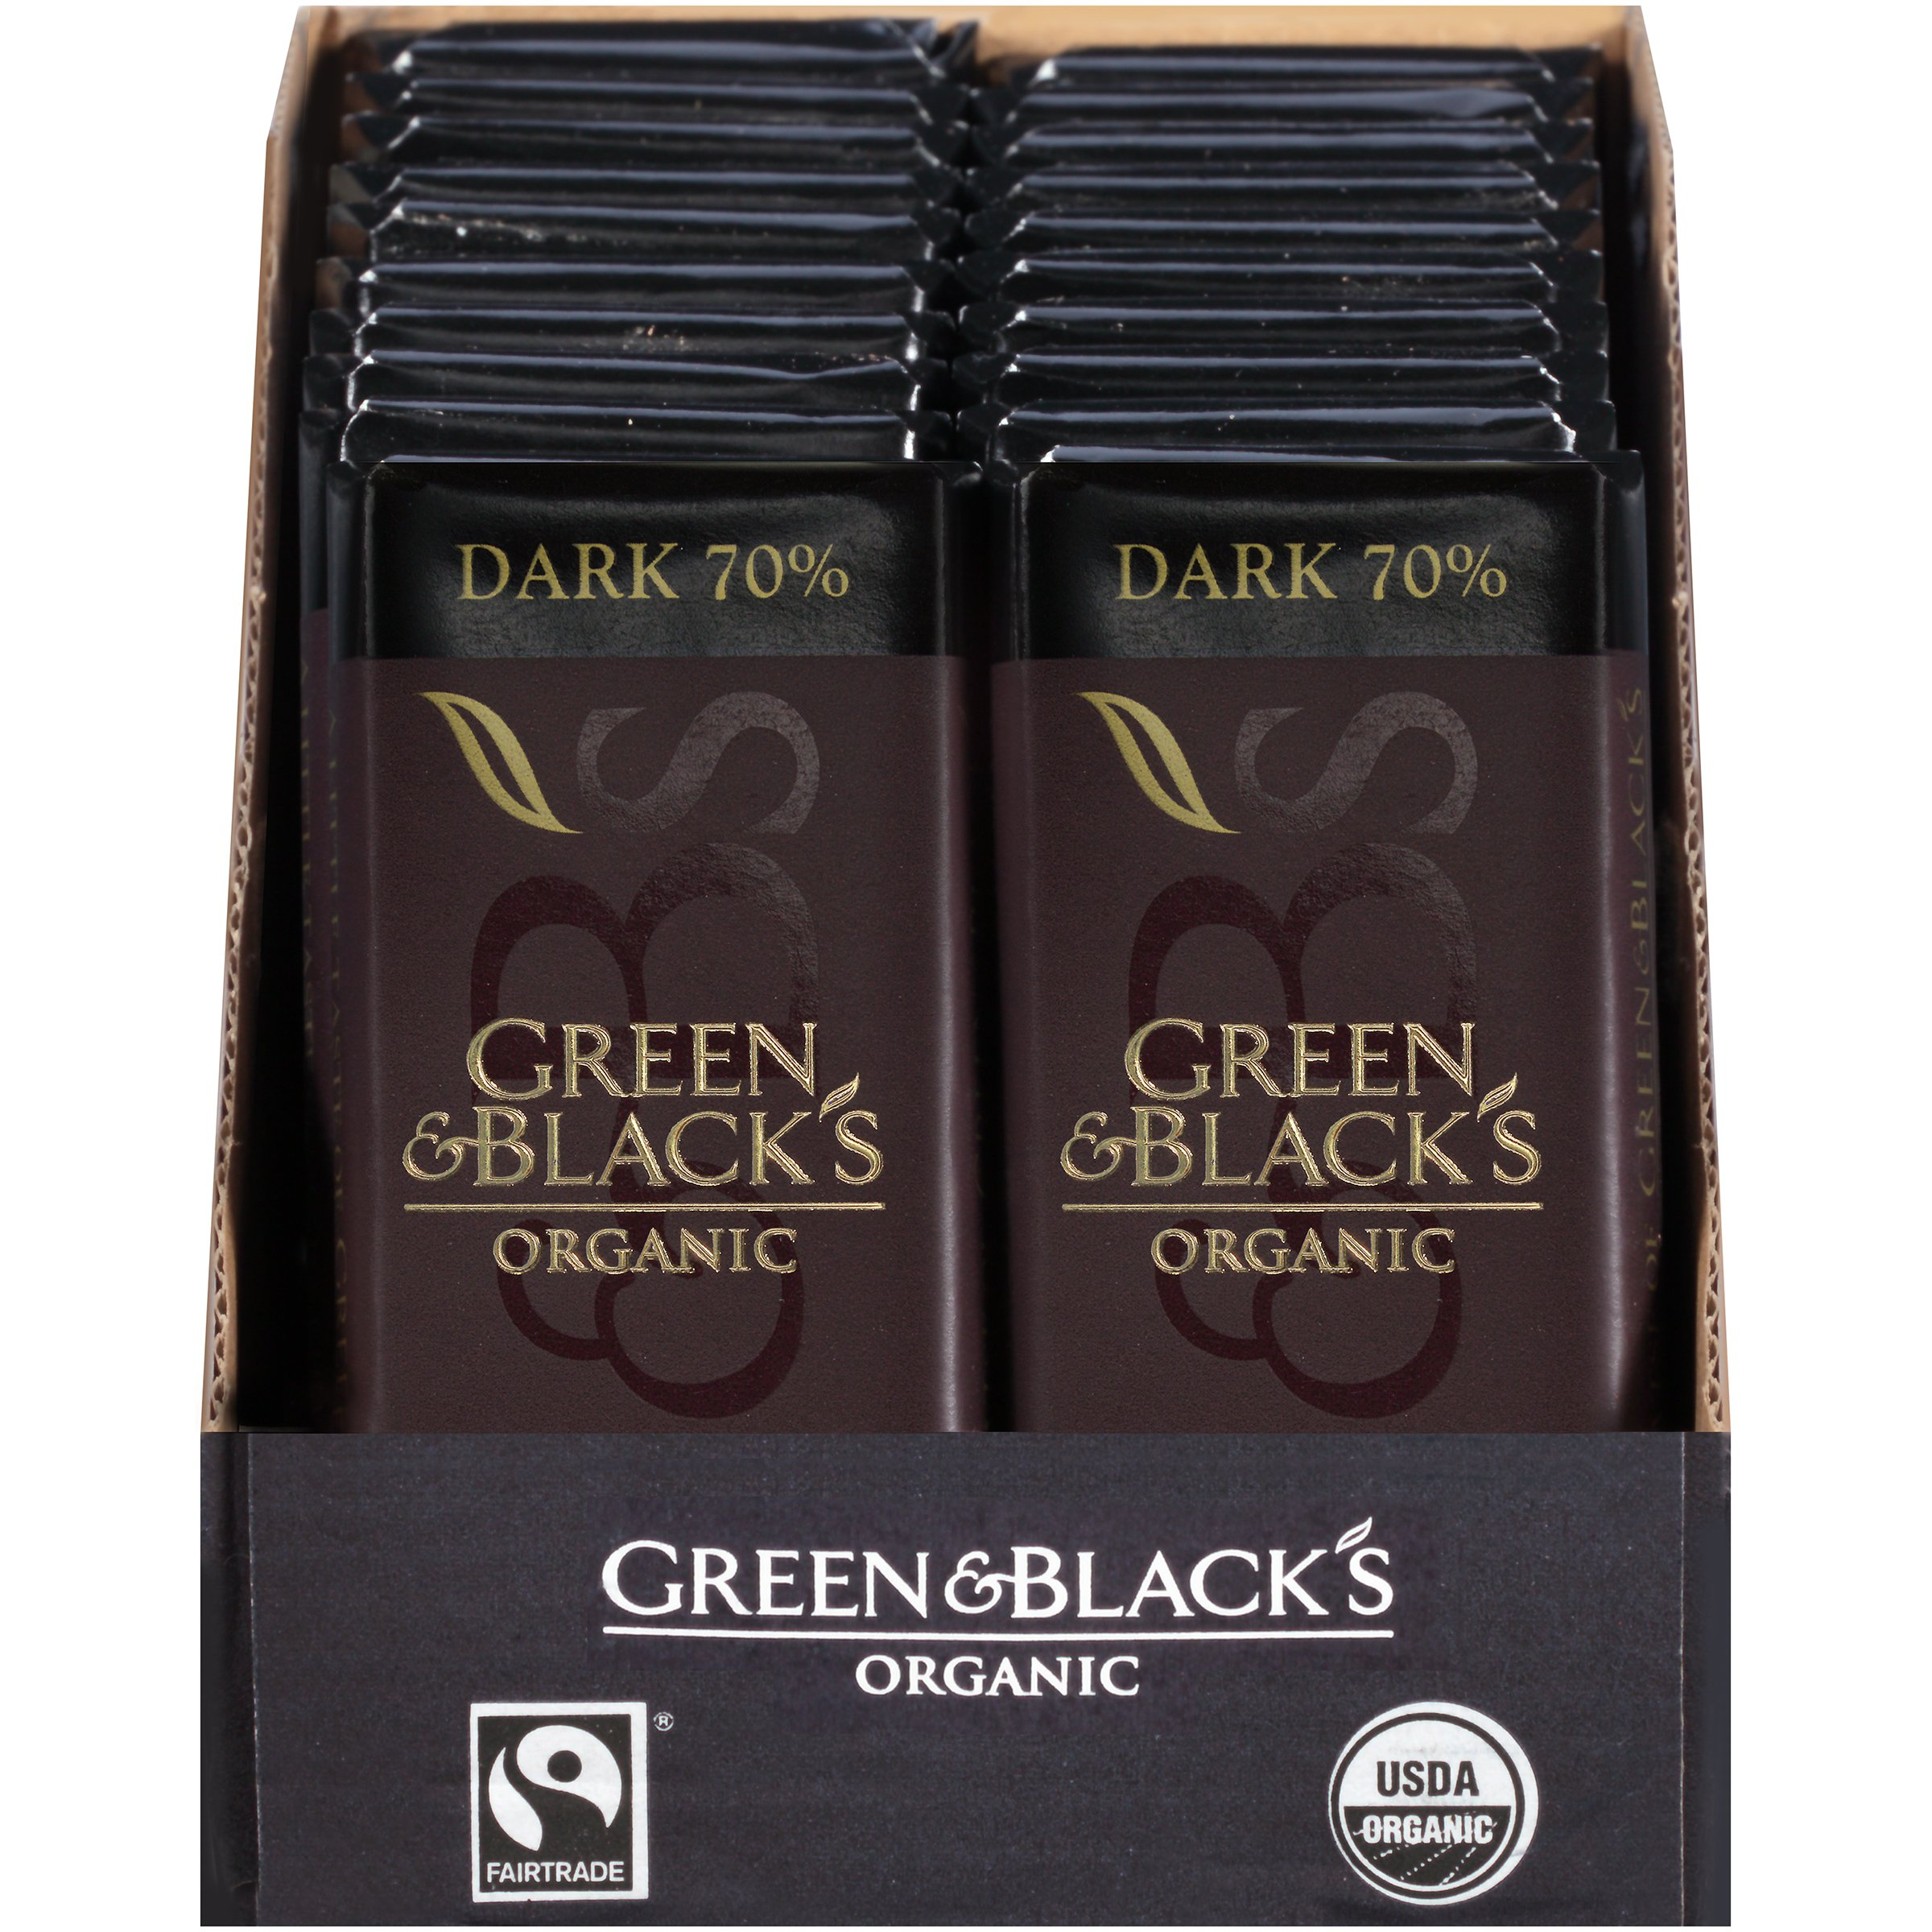 Green & Black's Organic Dark Chocolate (20 total bars) 70% Cacao Bars by Green & Black's